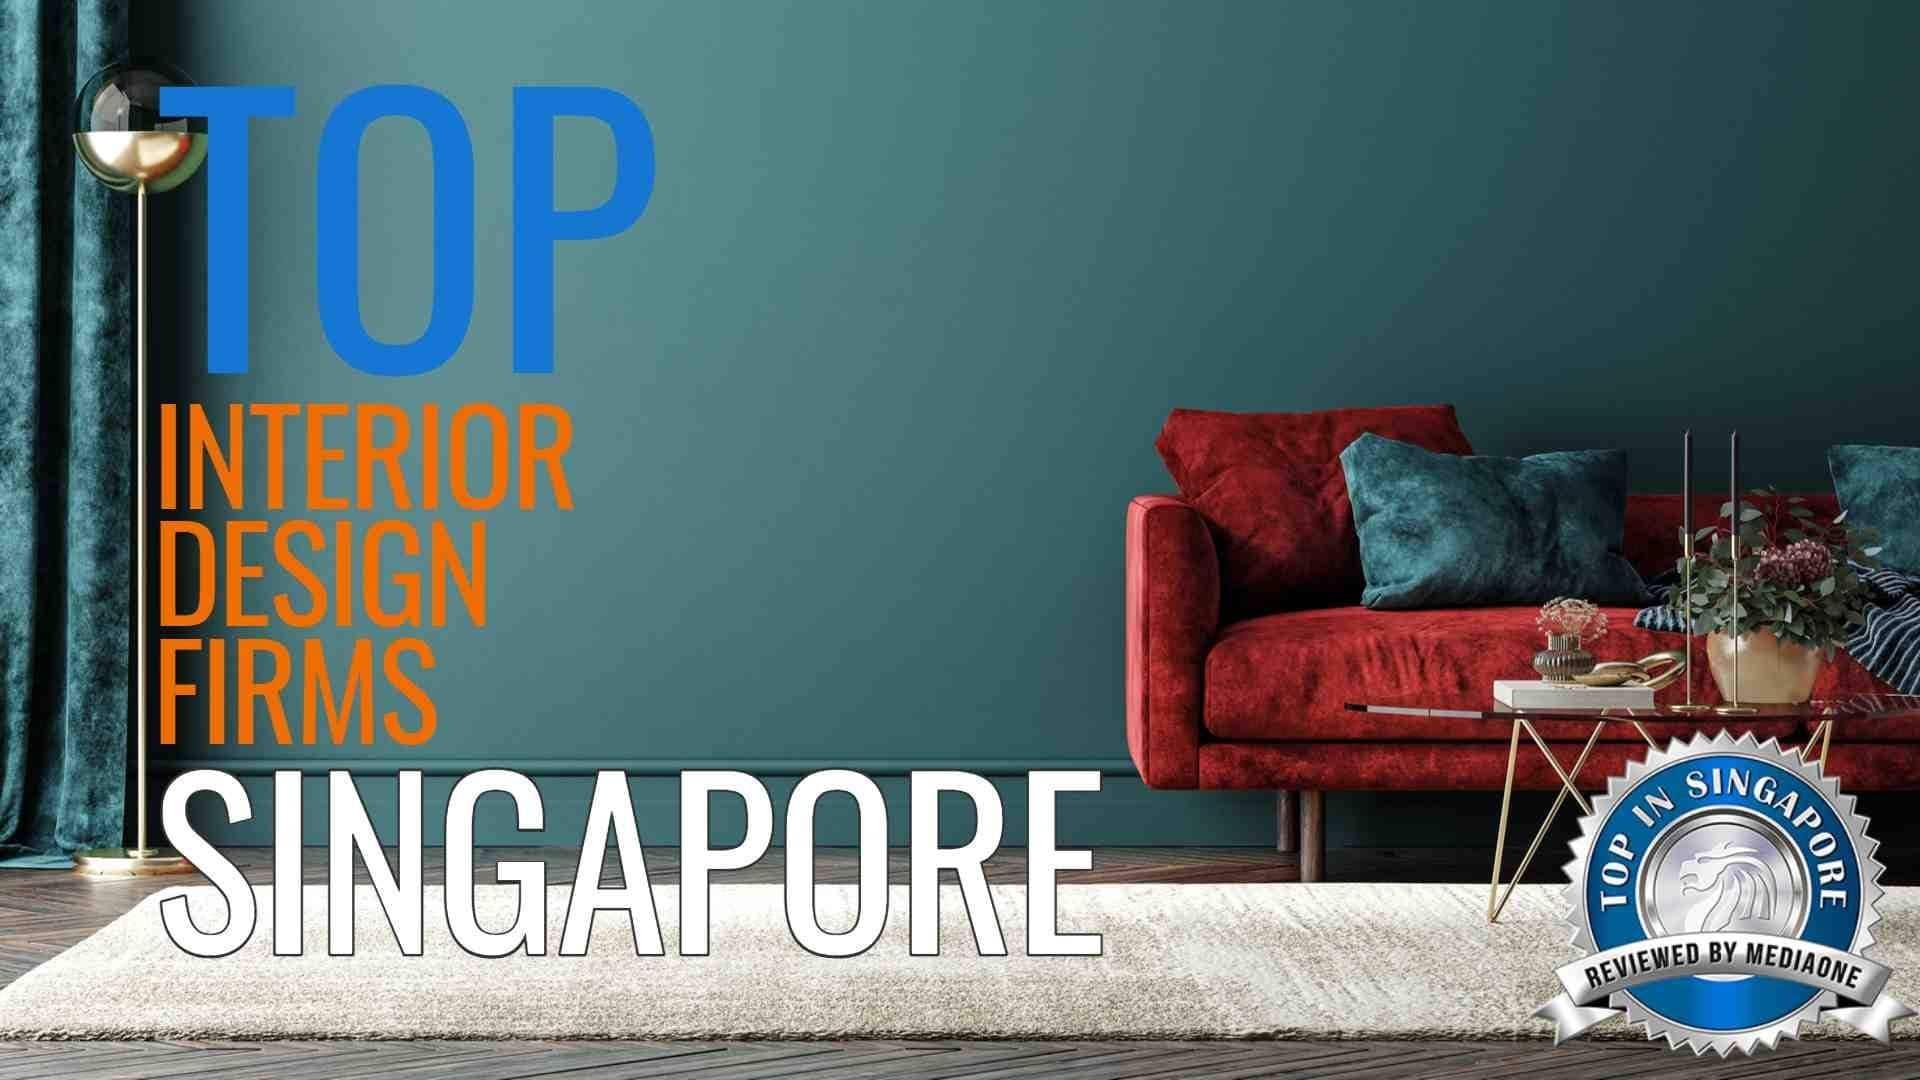 Top Interior Design Firms In Singapore